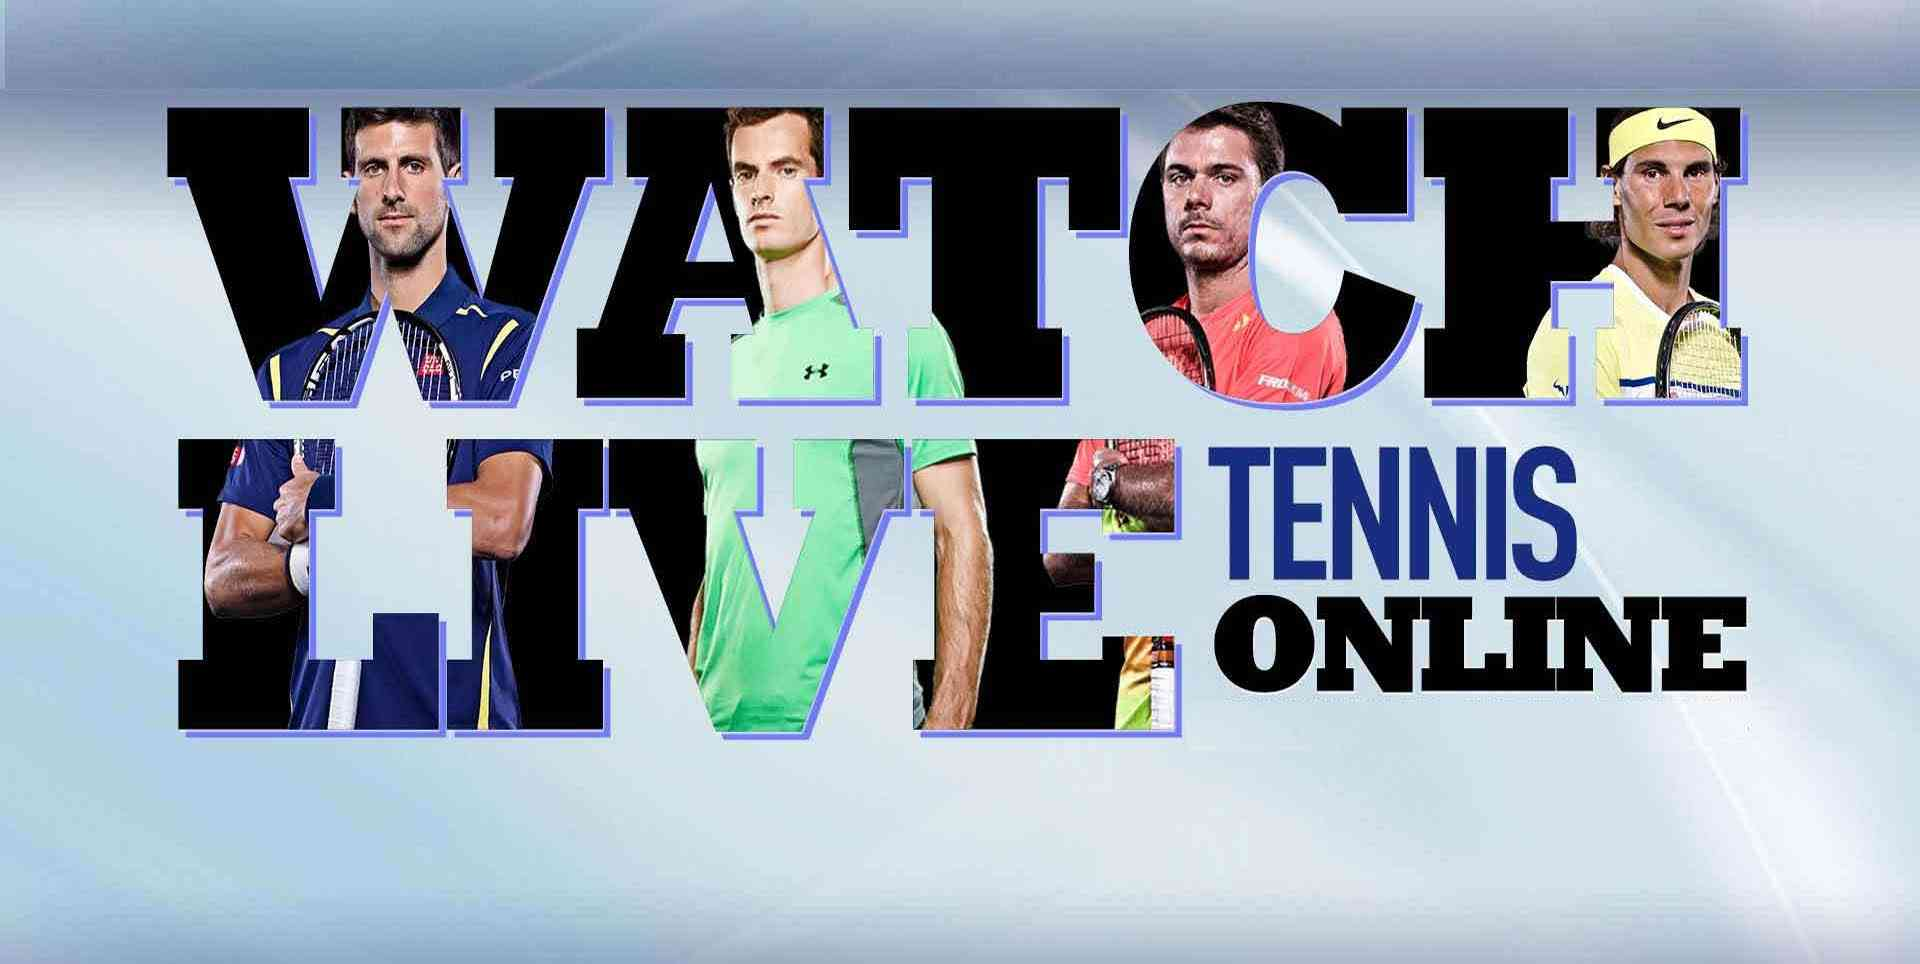 Watch T. Berdych vs P. Kohlschreiber Semi Final Live